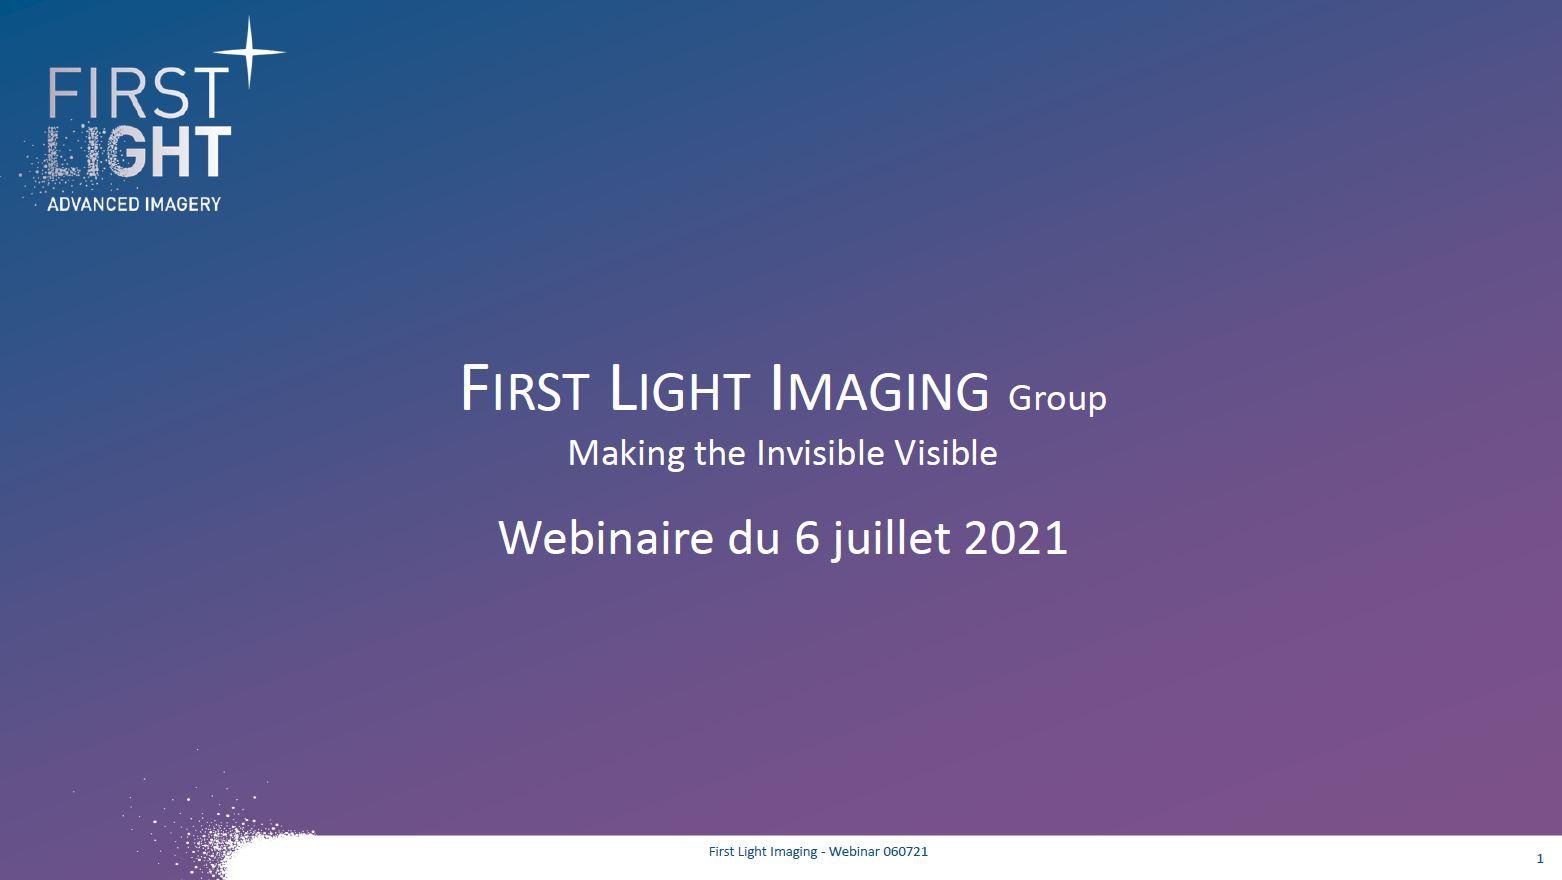 WEBINAR FIRST LIGHT IMAGING - ZOOM RESEAU OPTITEC